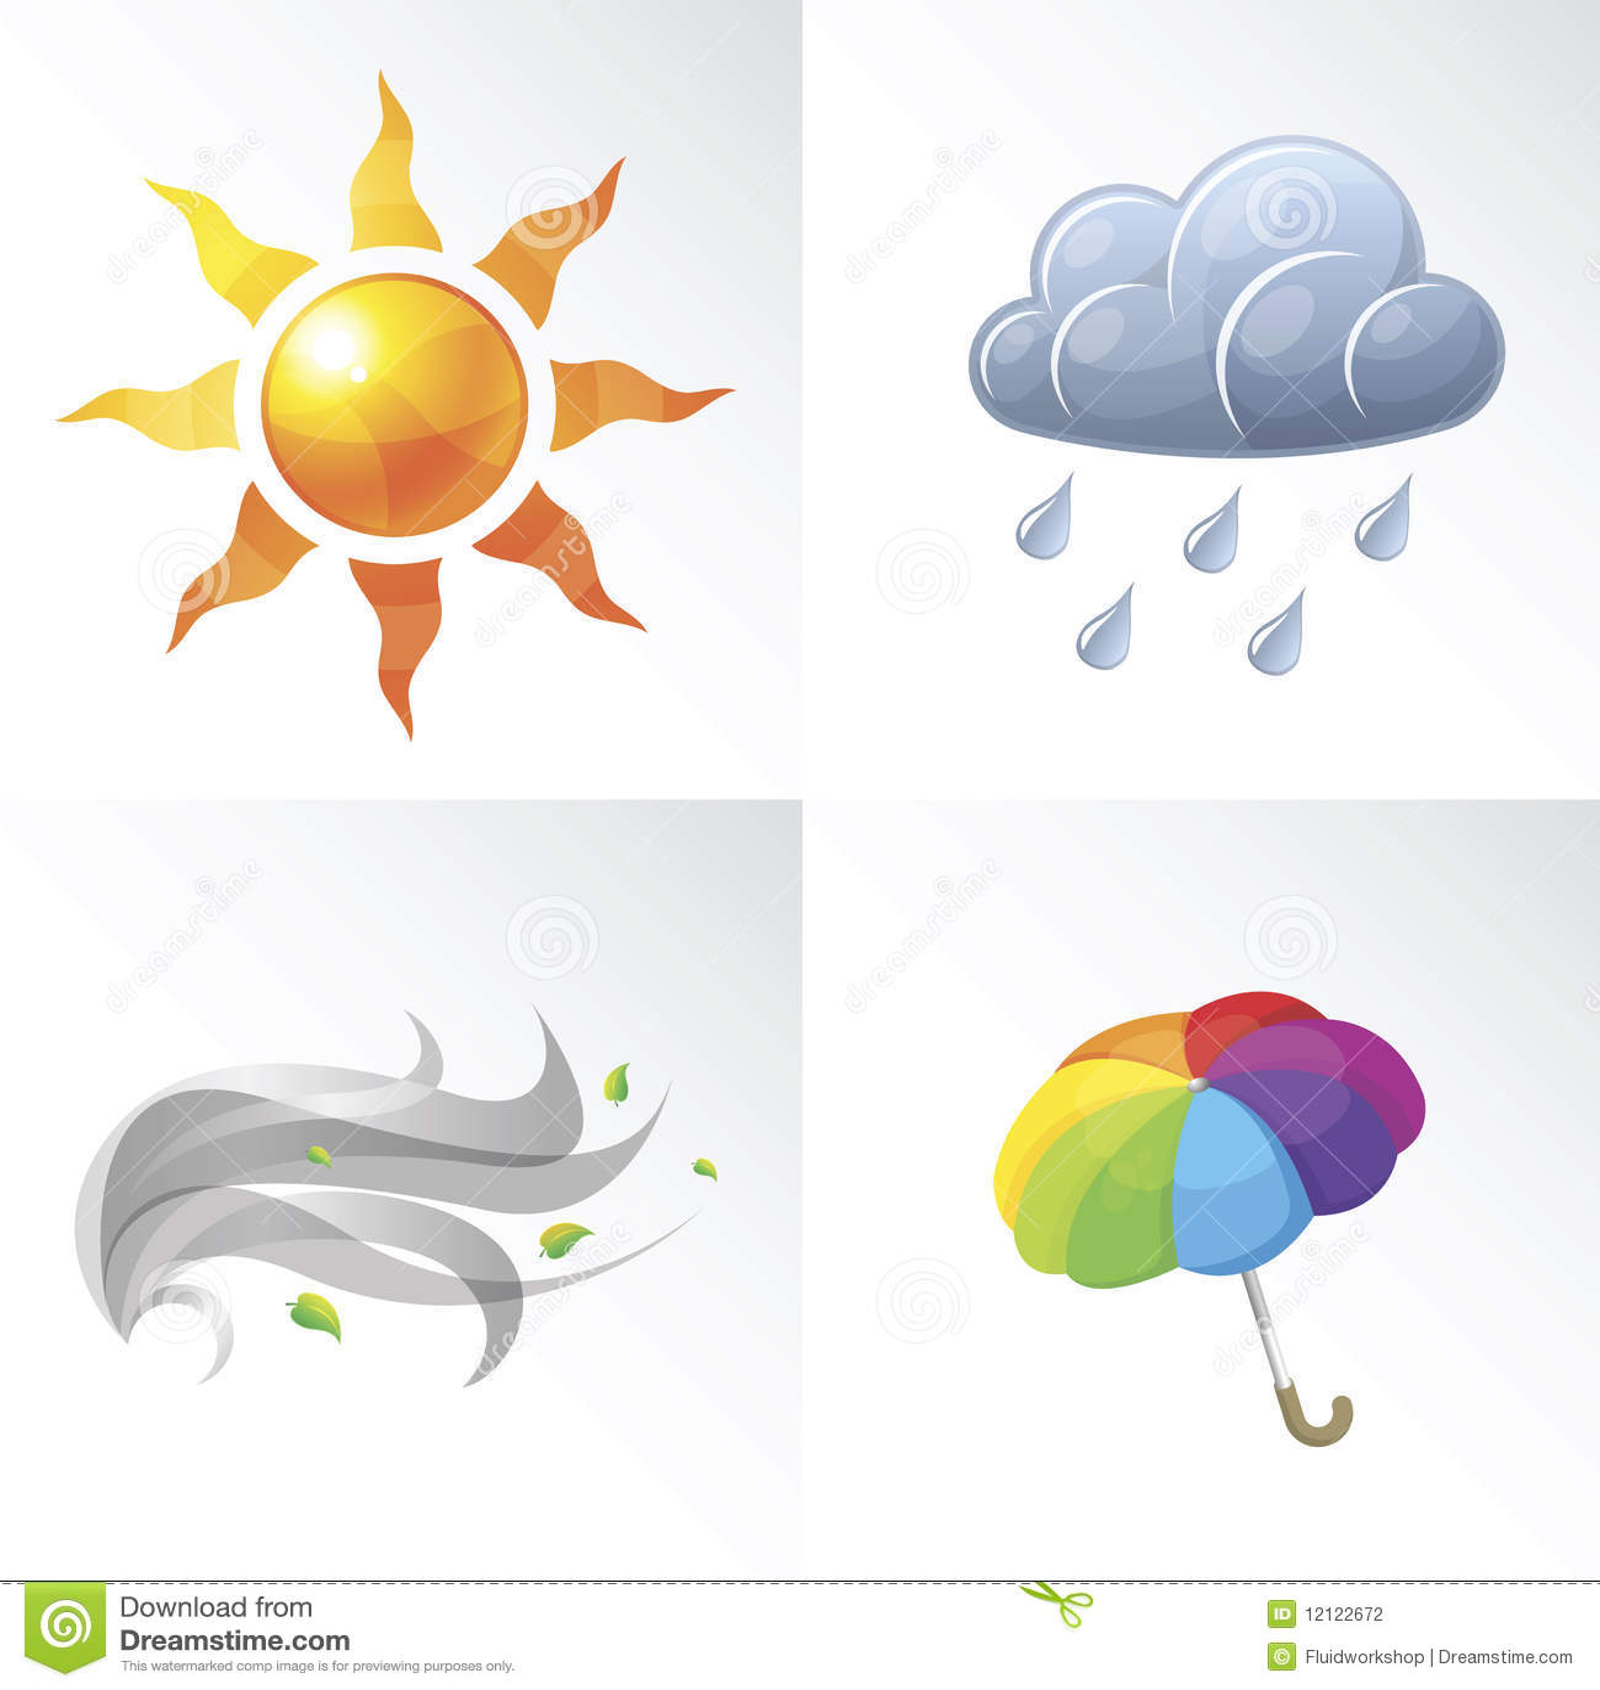 Stock Photography Vector Weather Symbols Image12122672 on Weather Forecast Symbols